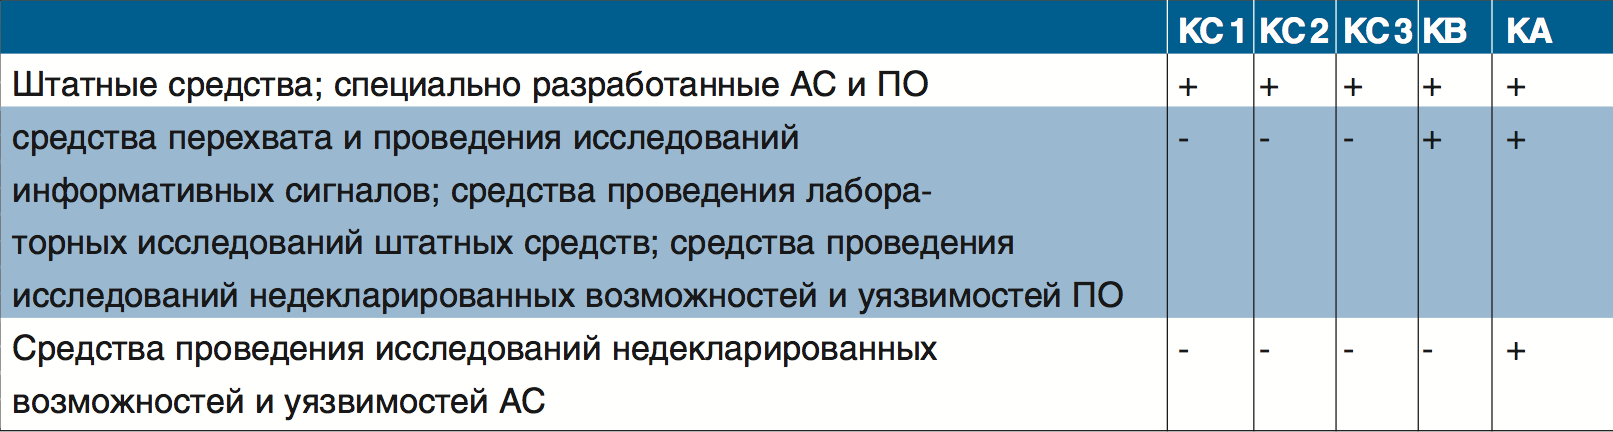 marshalko_tab2